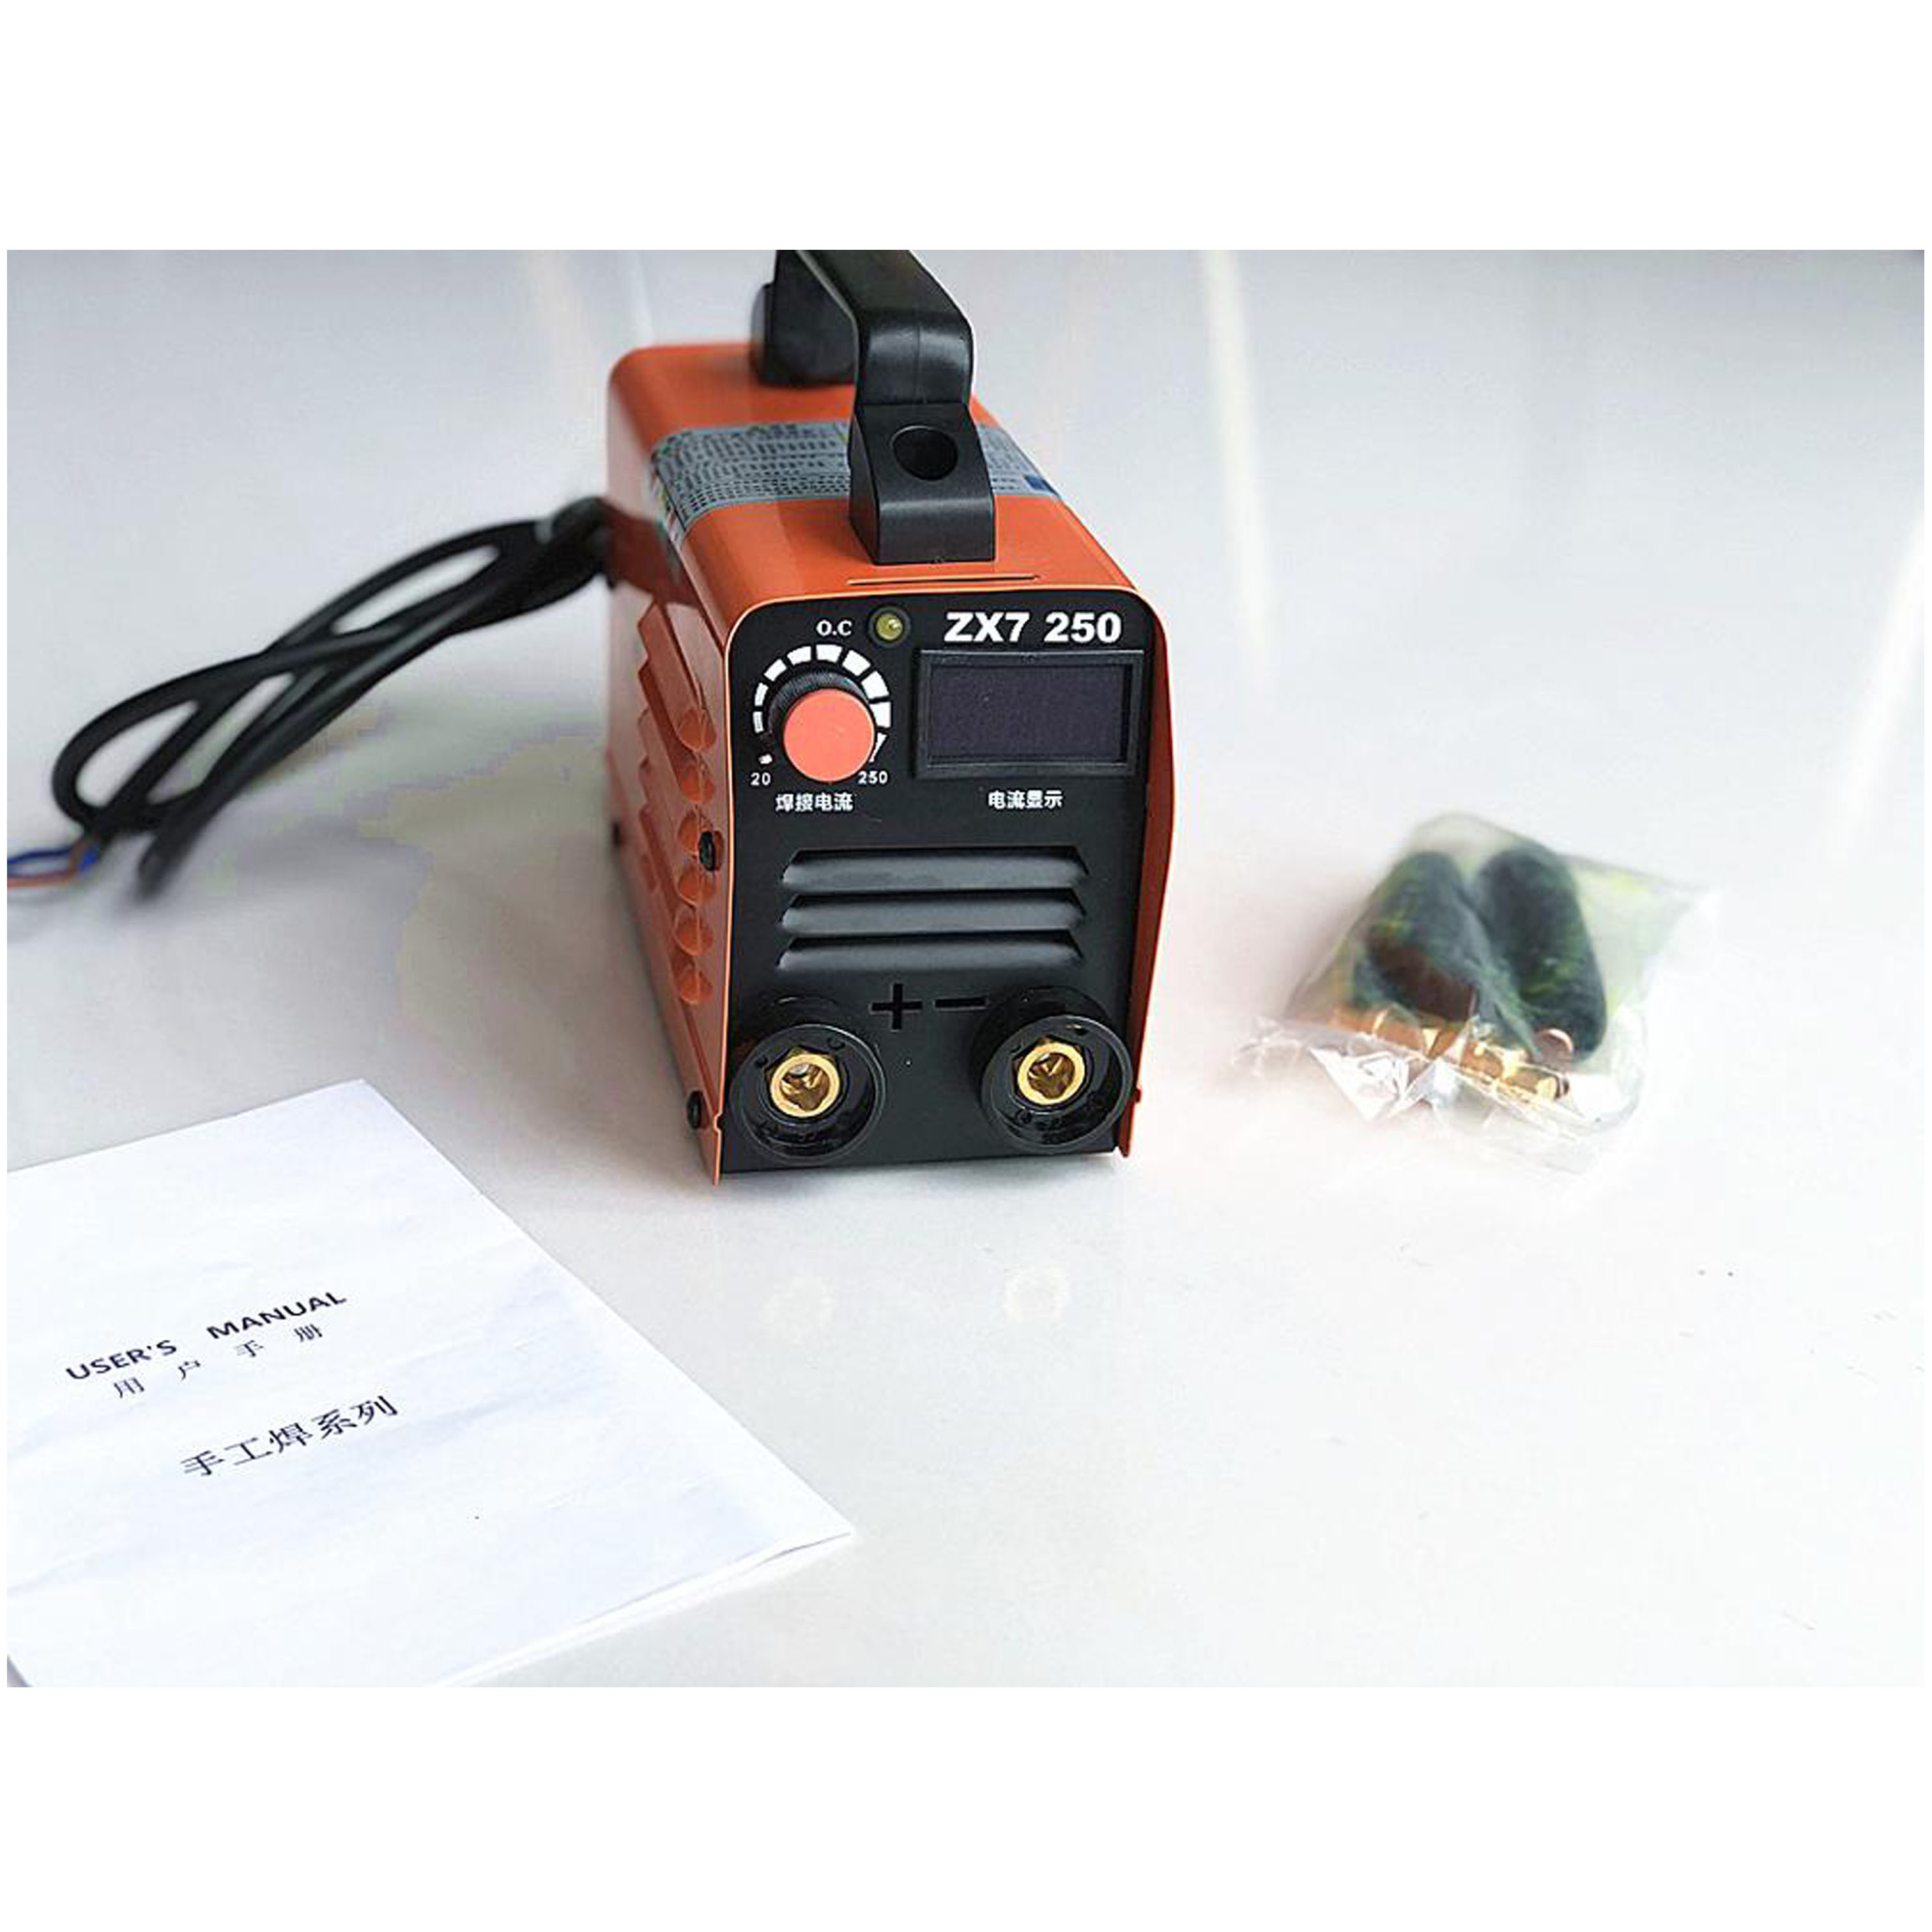 RU Delivery For Free 250A 220V Compact Mini MMA Welder Inverter ARC Welding Machine Stick Welder